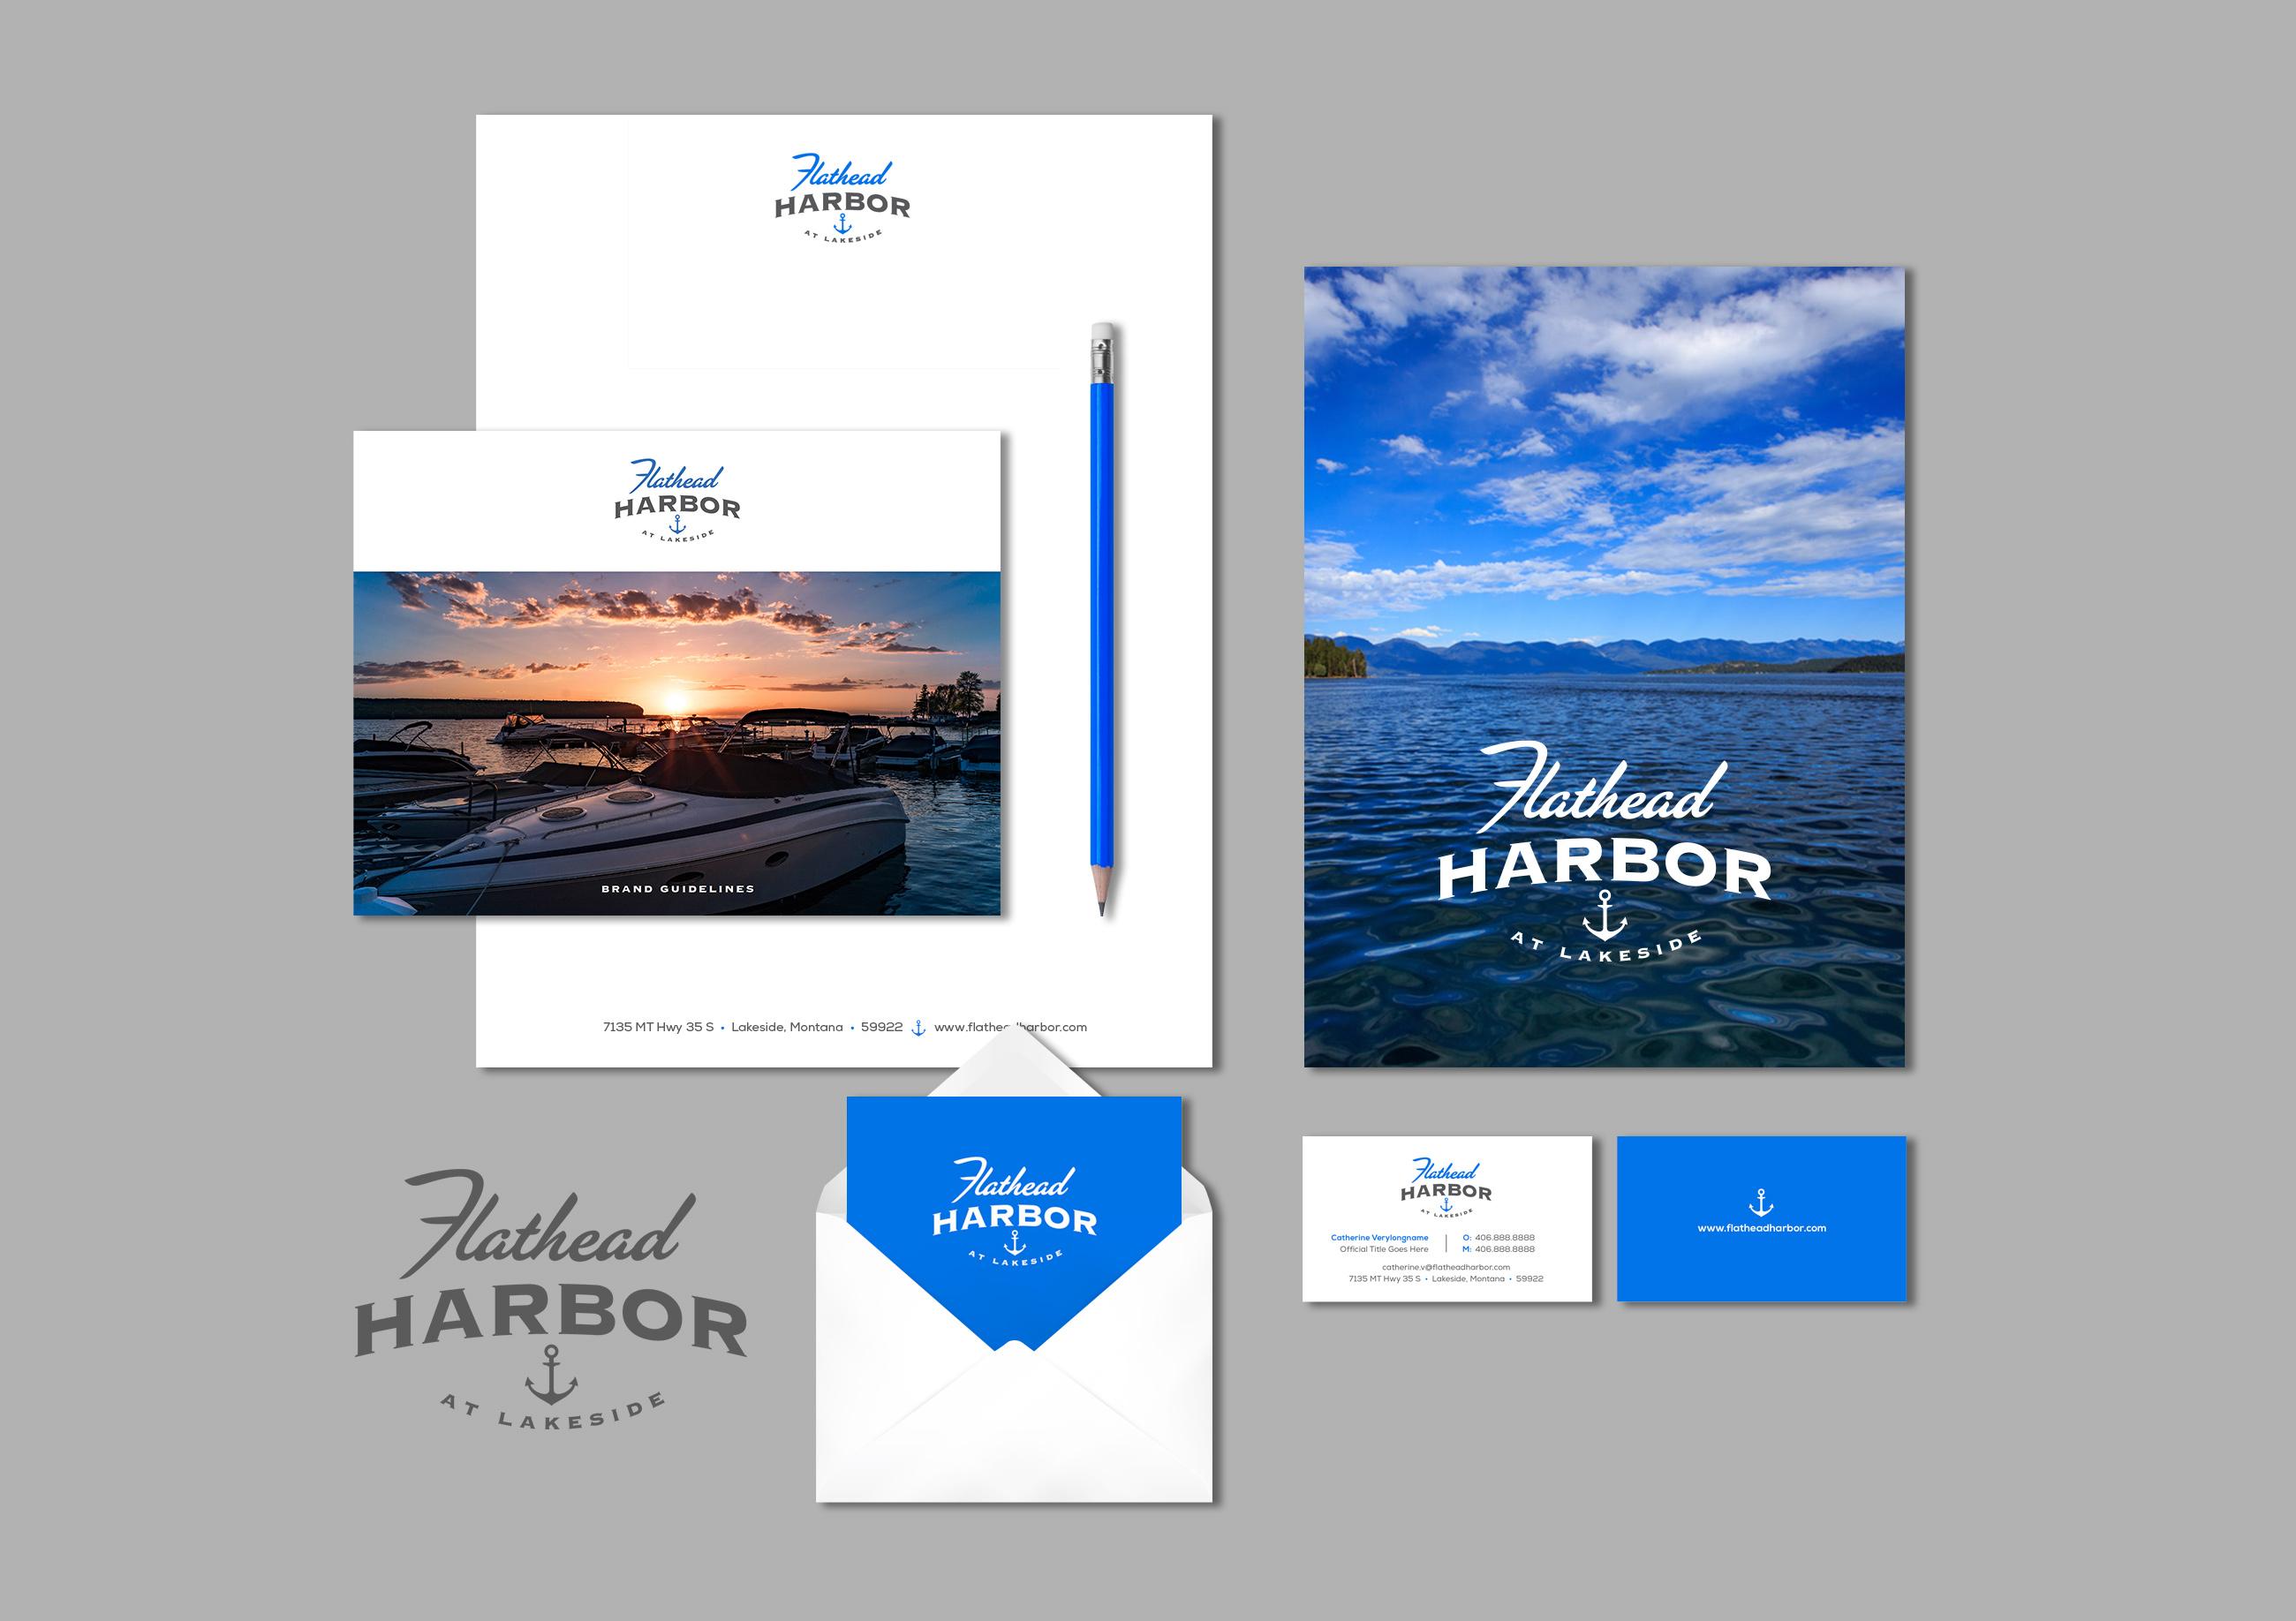 Flathead-Harbor-brand-items